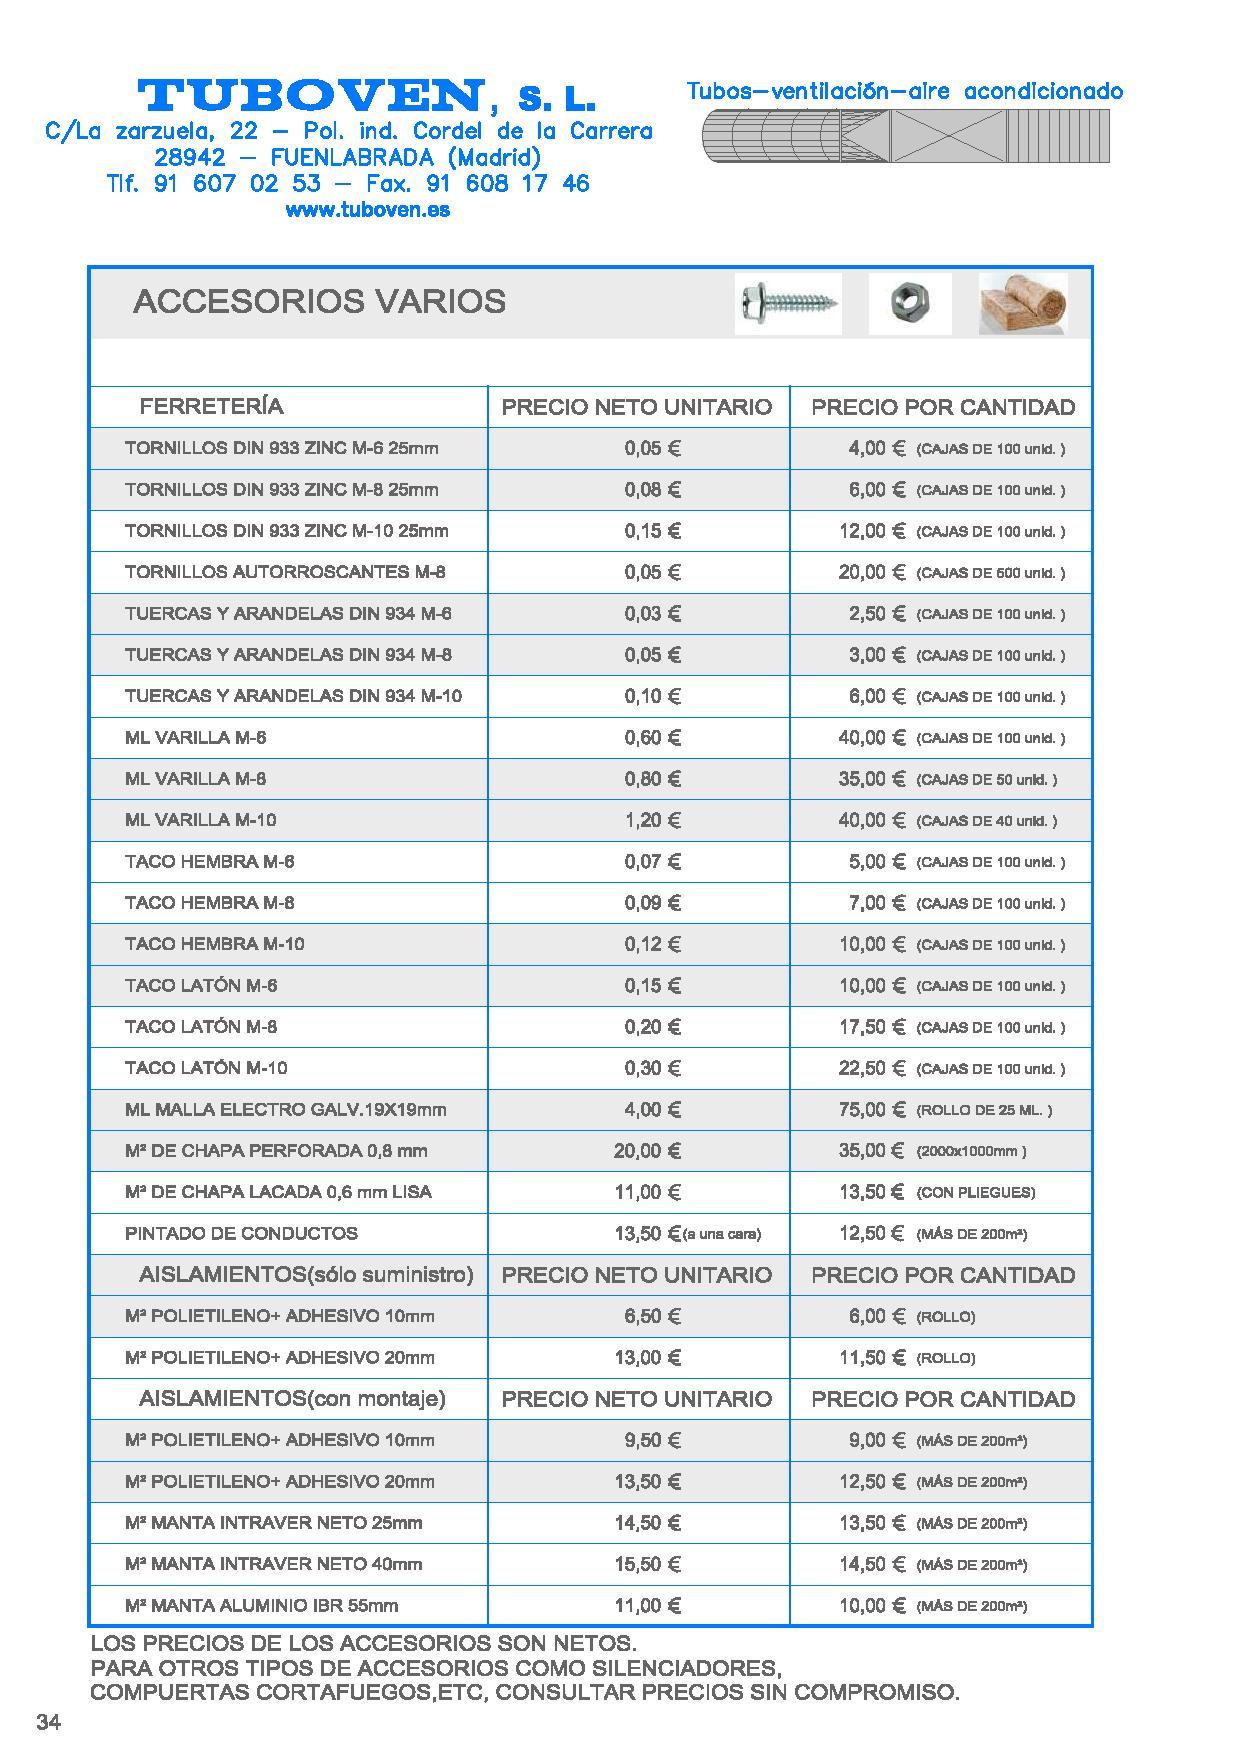 Detalle - Accesorios II